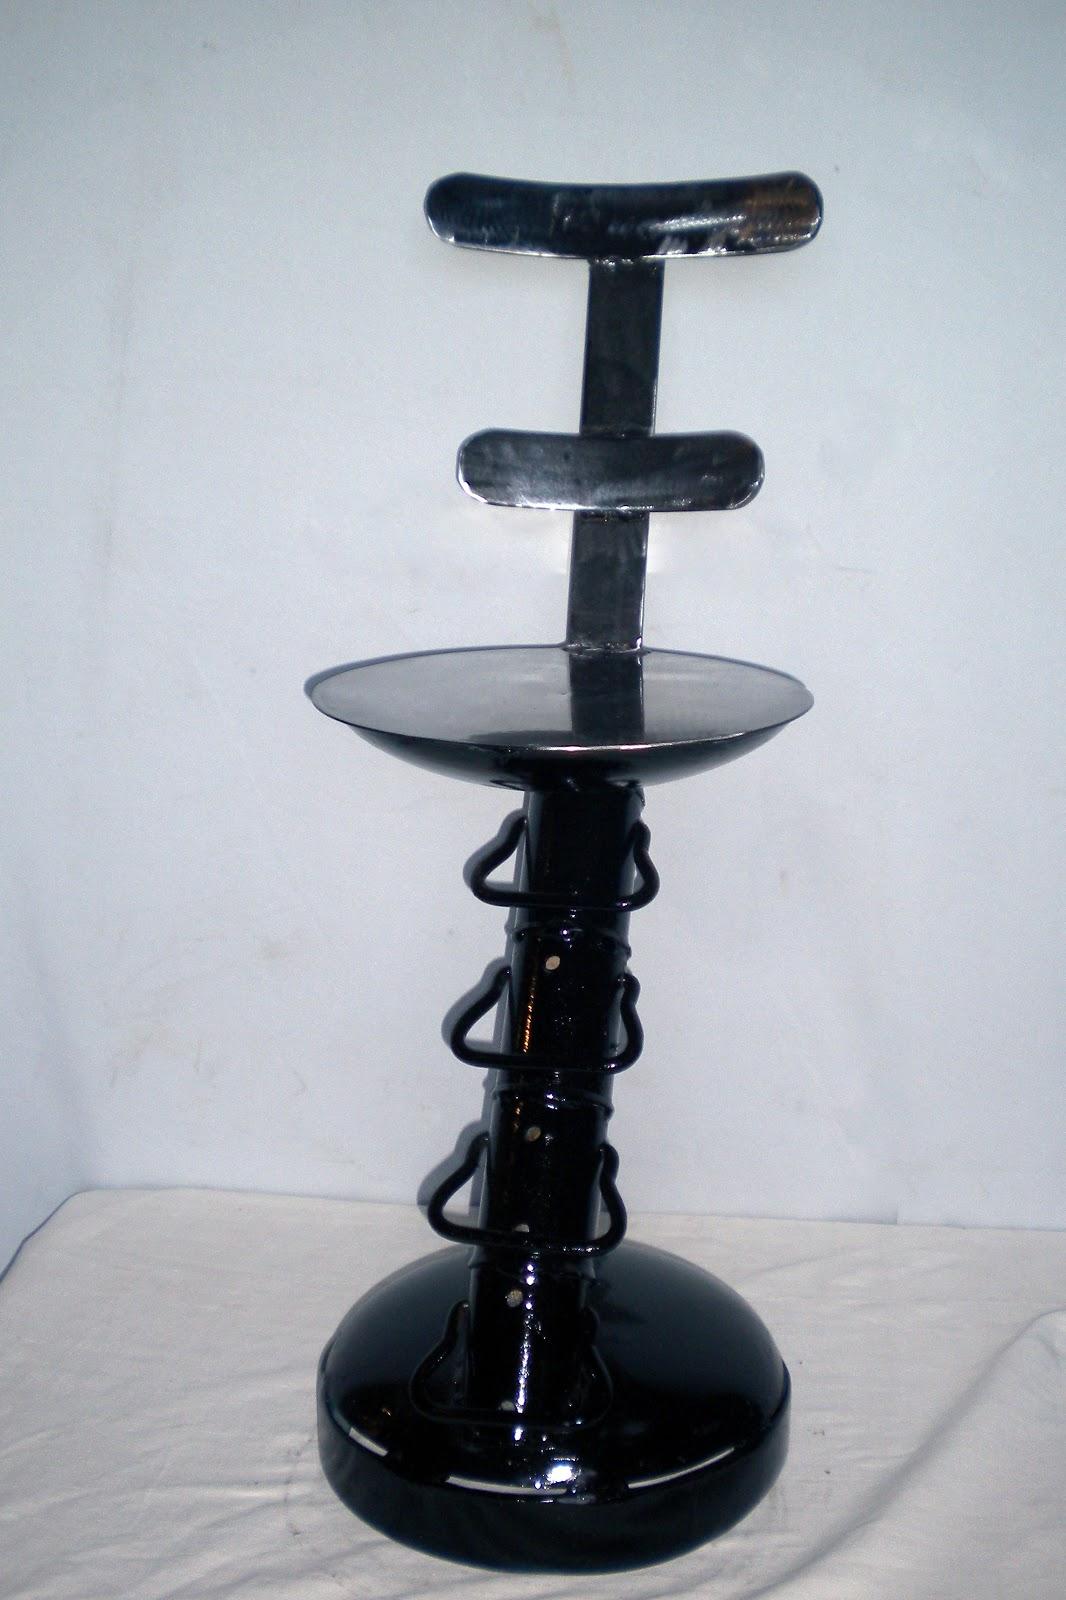 l 39 effet papillon v ca sculpteur l 39 effet pap 39. Black Bedroom Furniture Sets. Home Design Ideas